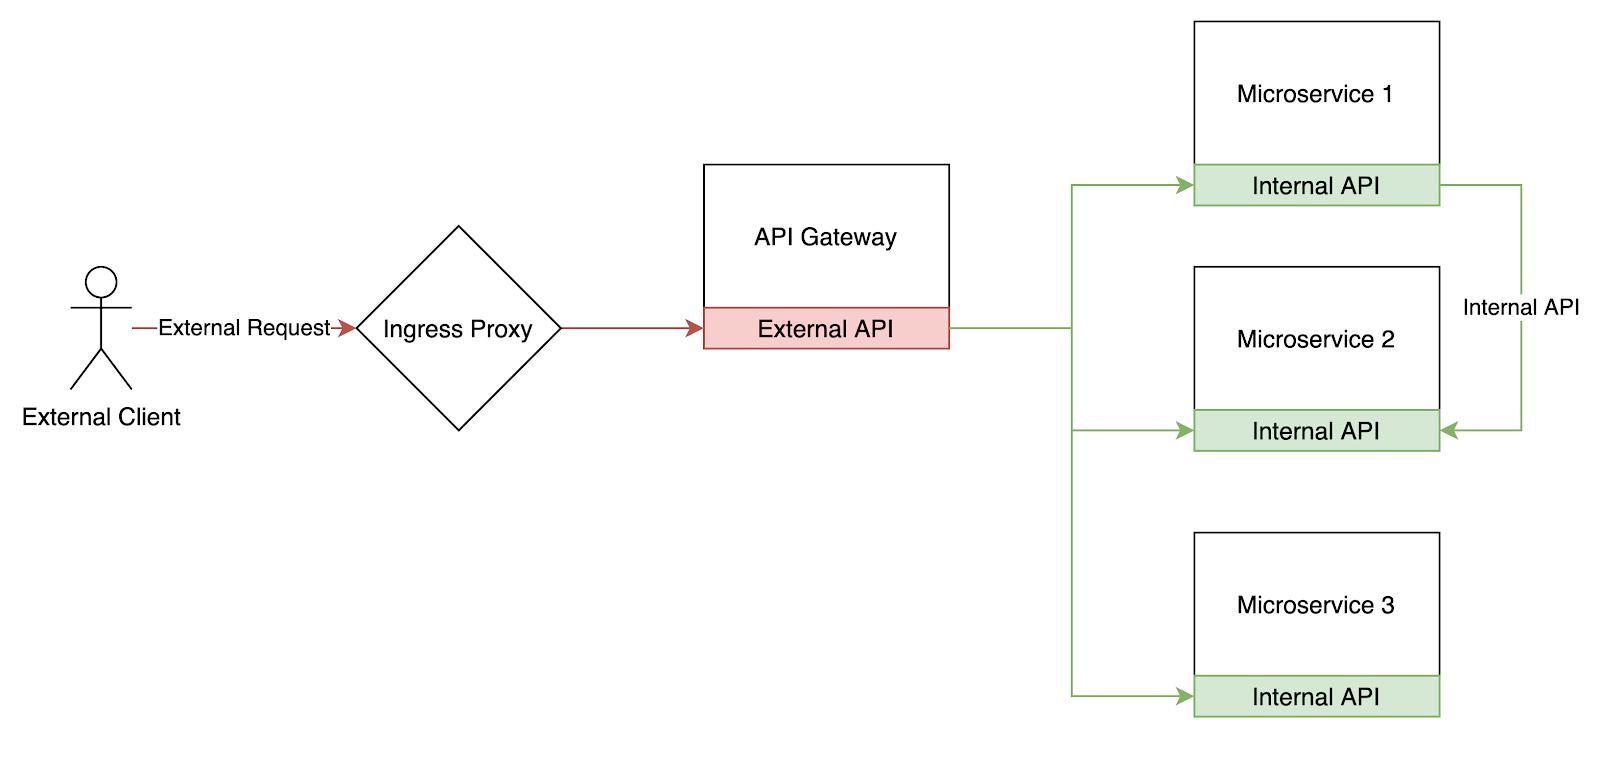 The API Gateway diagram